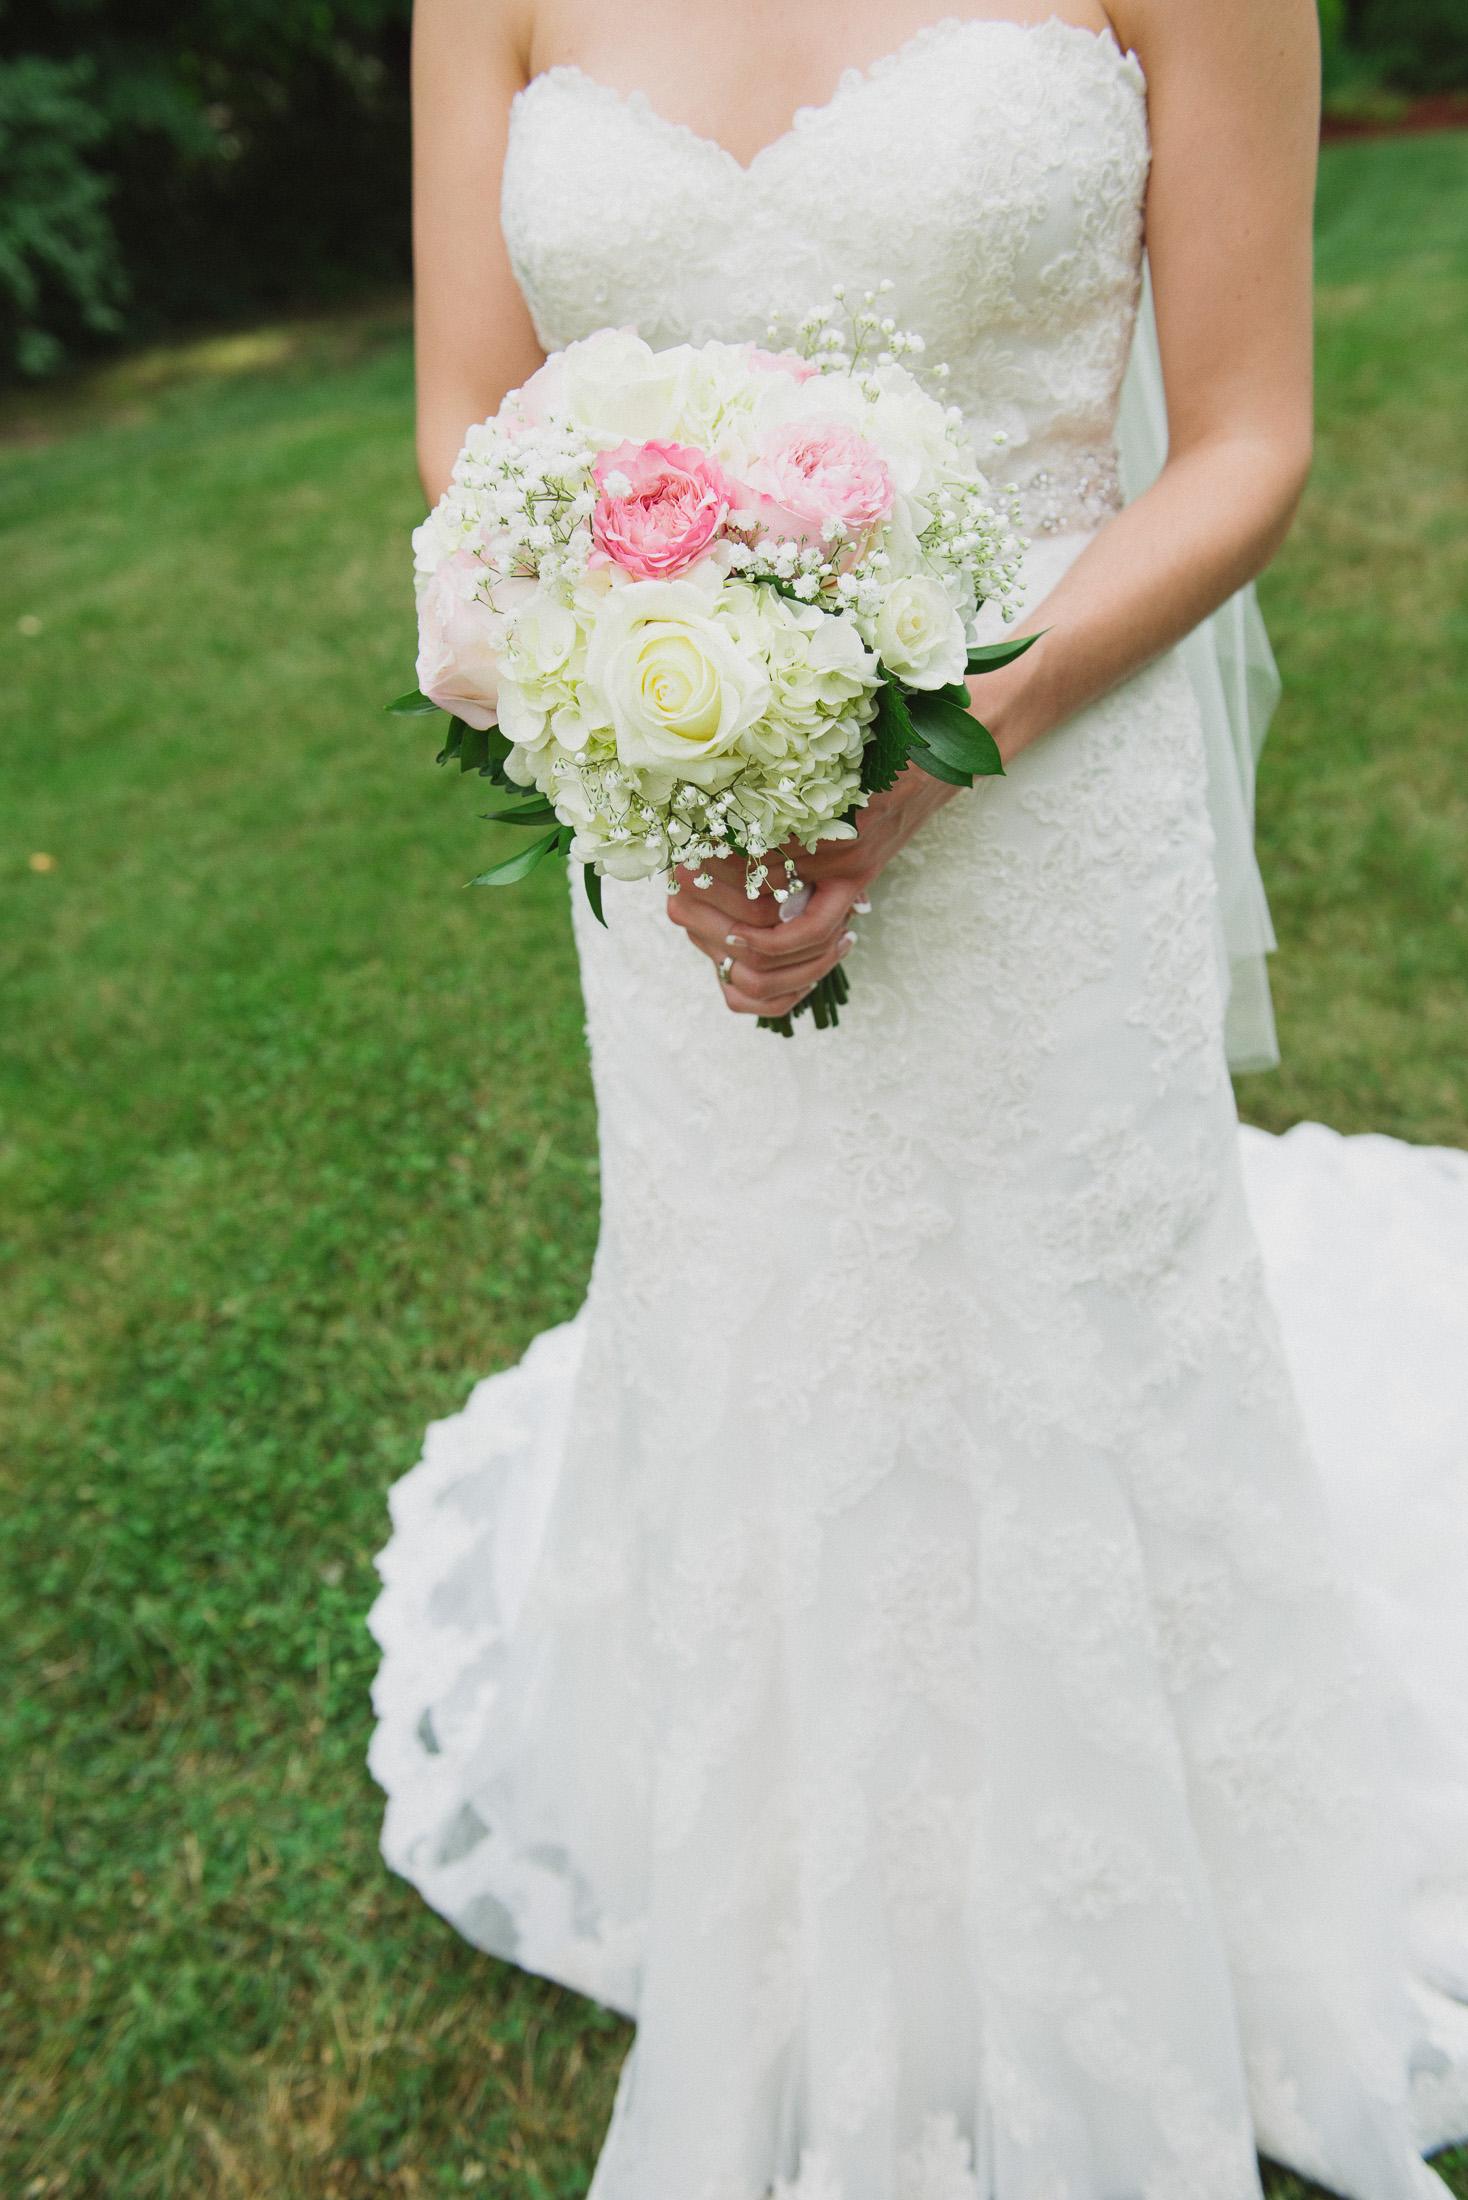 NH Wedding Photographer: bride holding bouquet